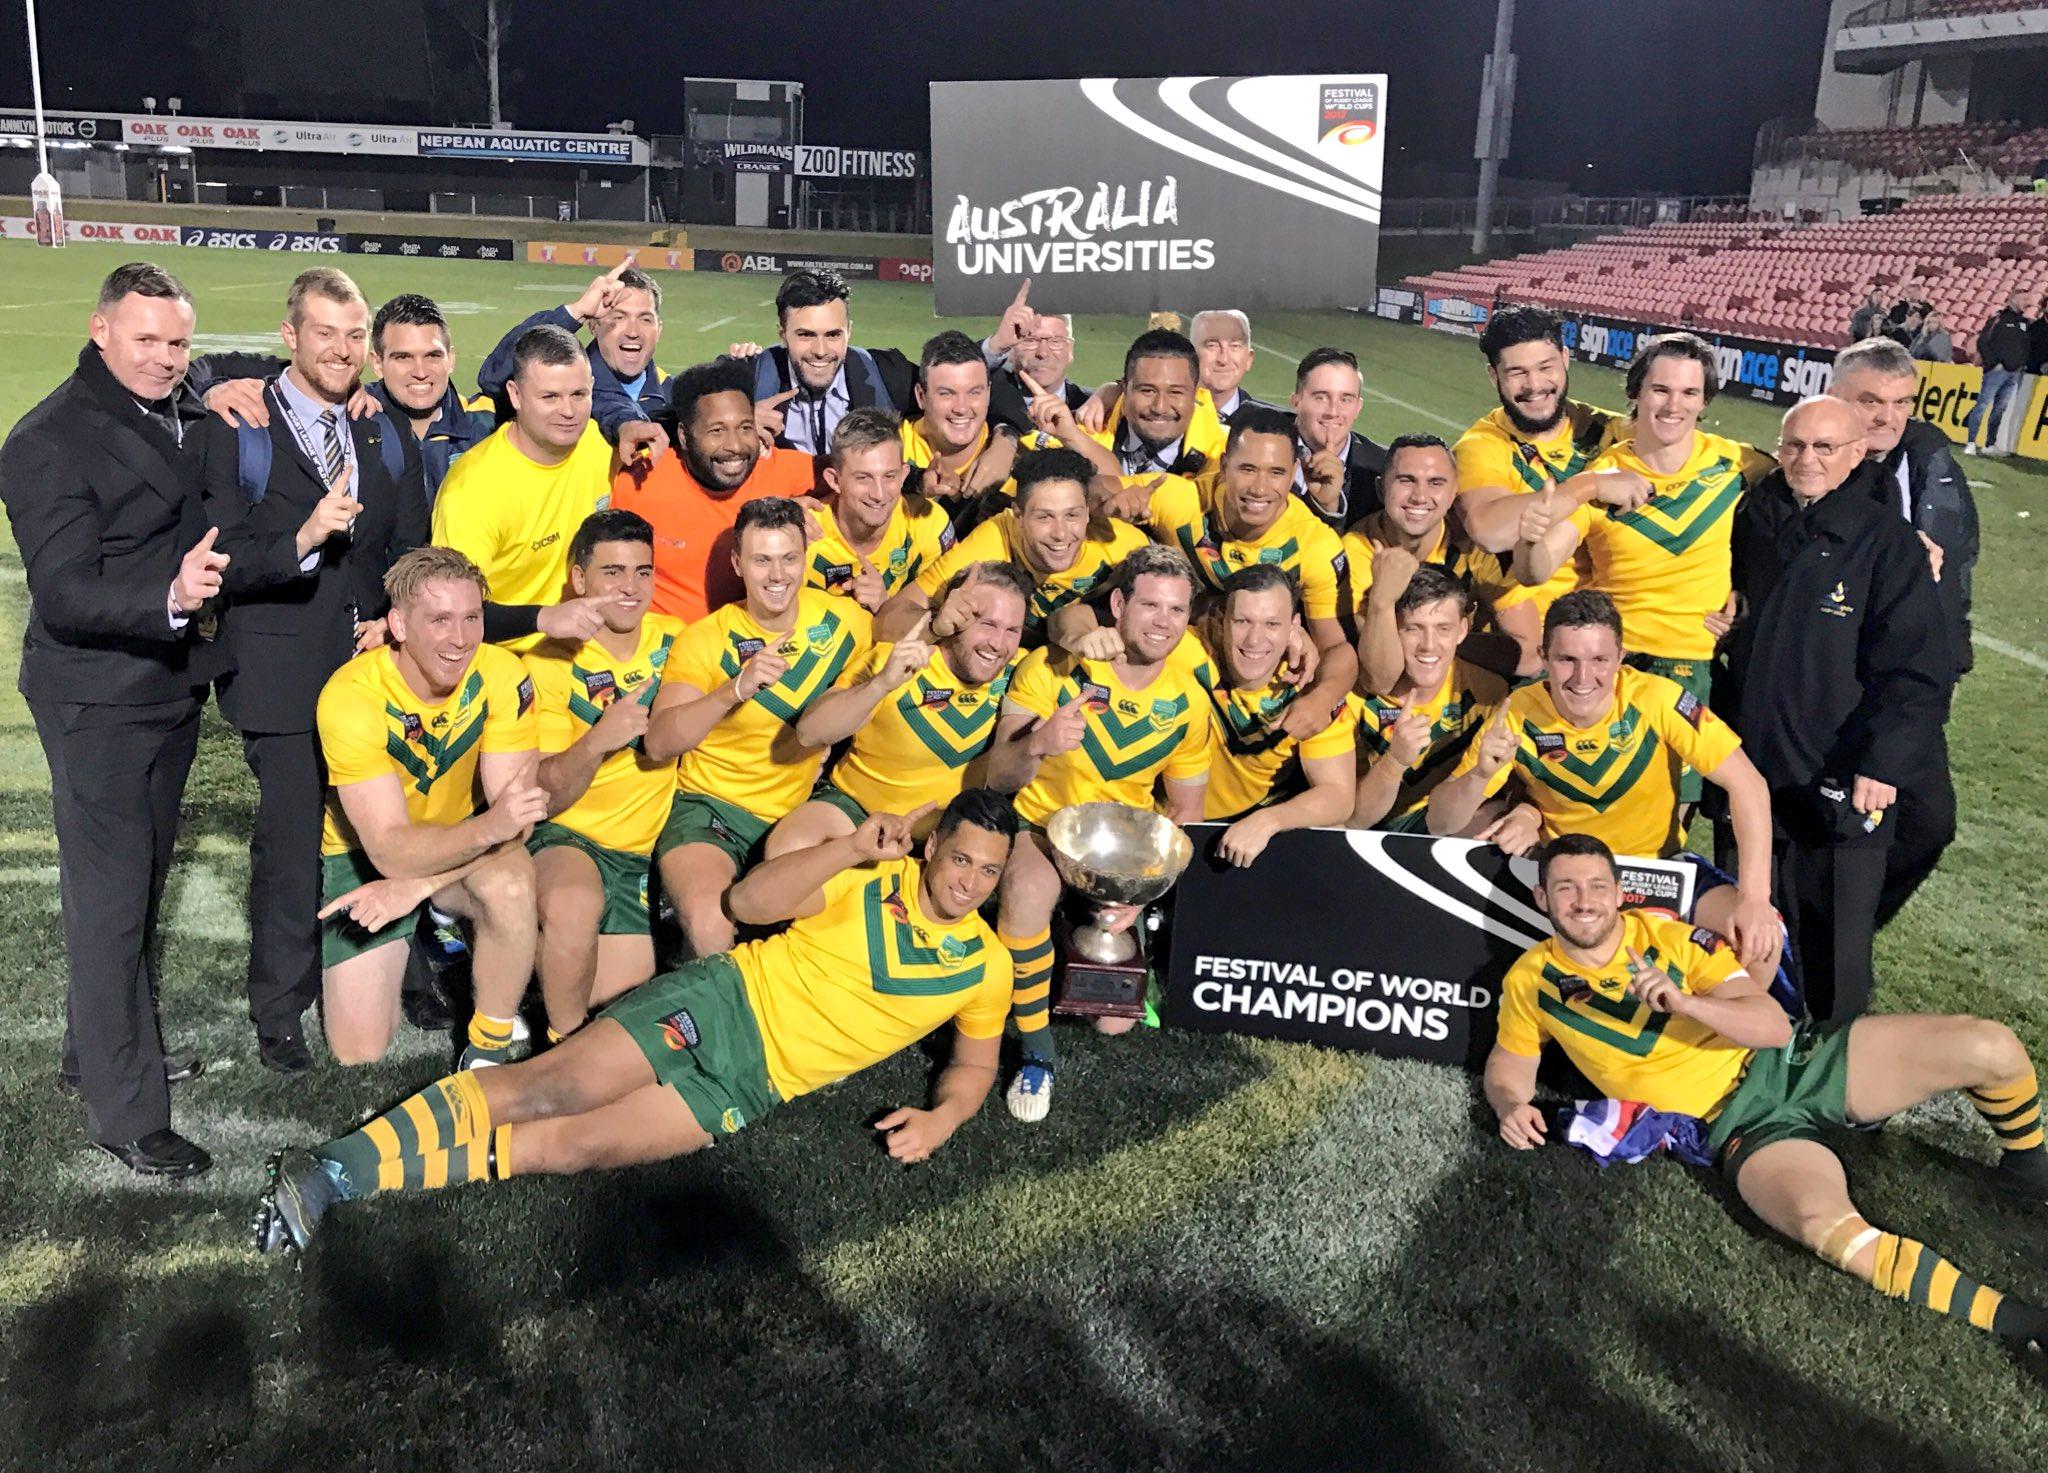 Australia claim sixth Universities World Cup title